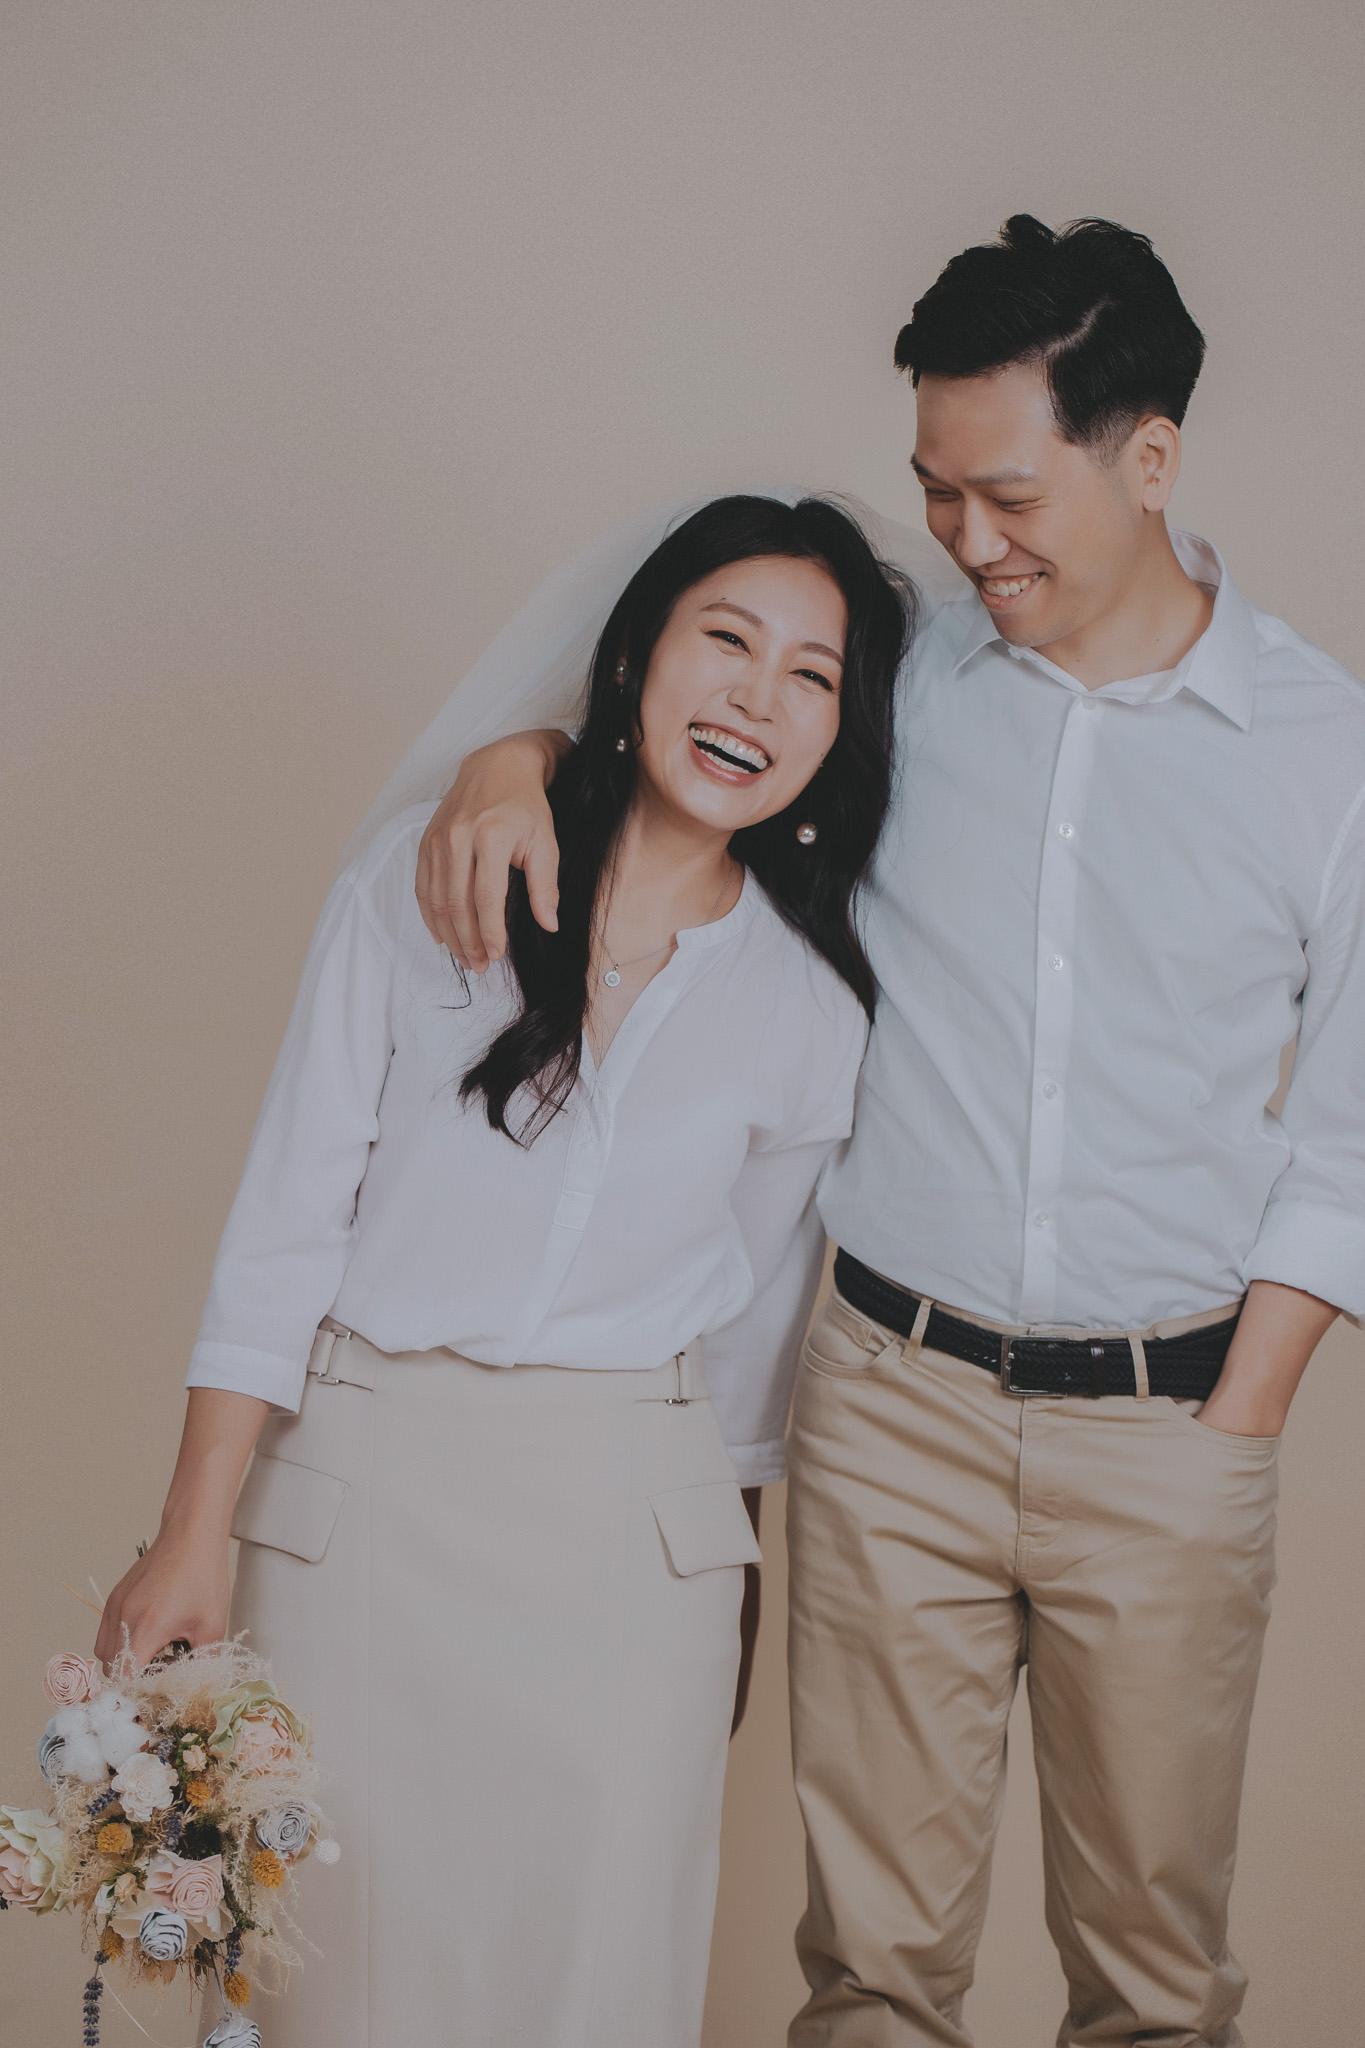 EW Easternwedding 婚攝 居米 婚紗 心之芳庭 小南法